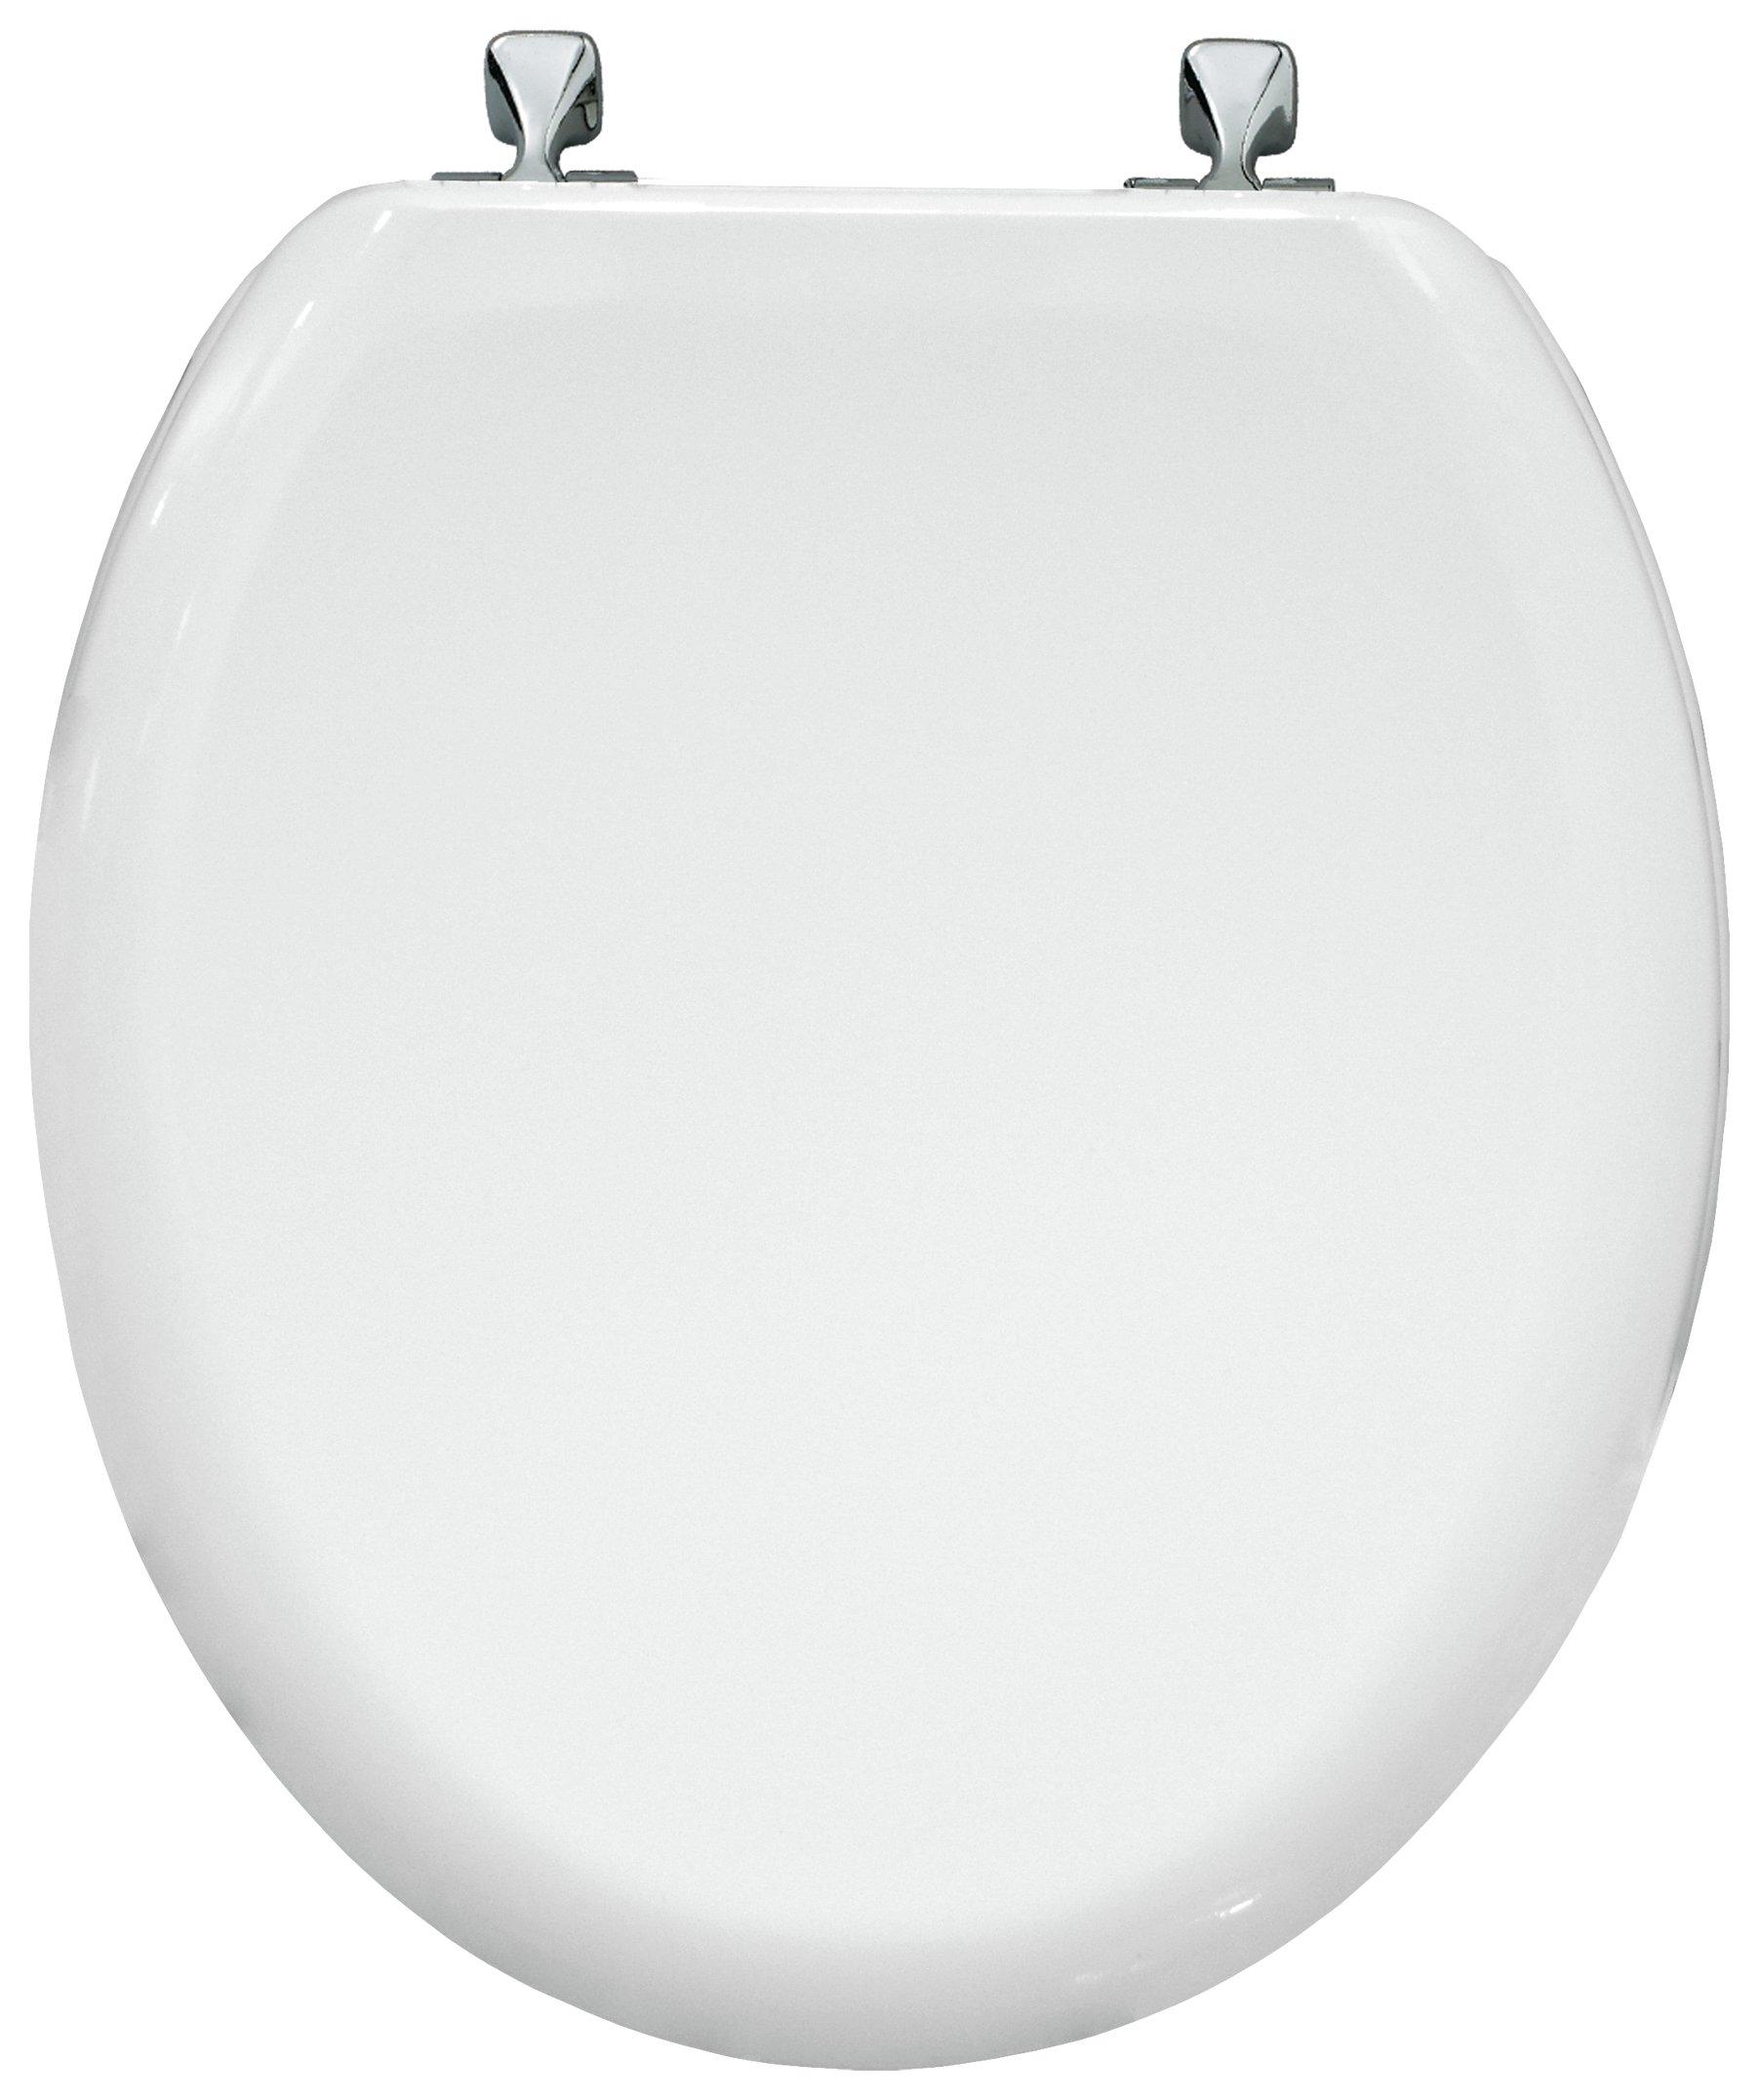 Bemis Fargo Moulded Wood Statite Toilet - White